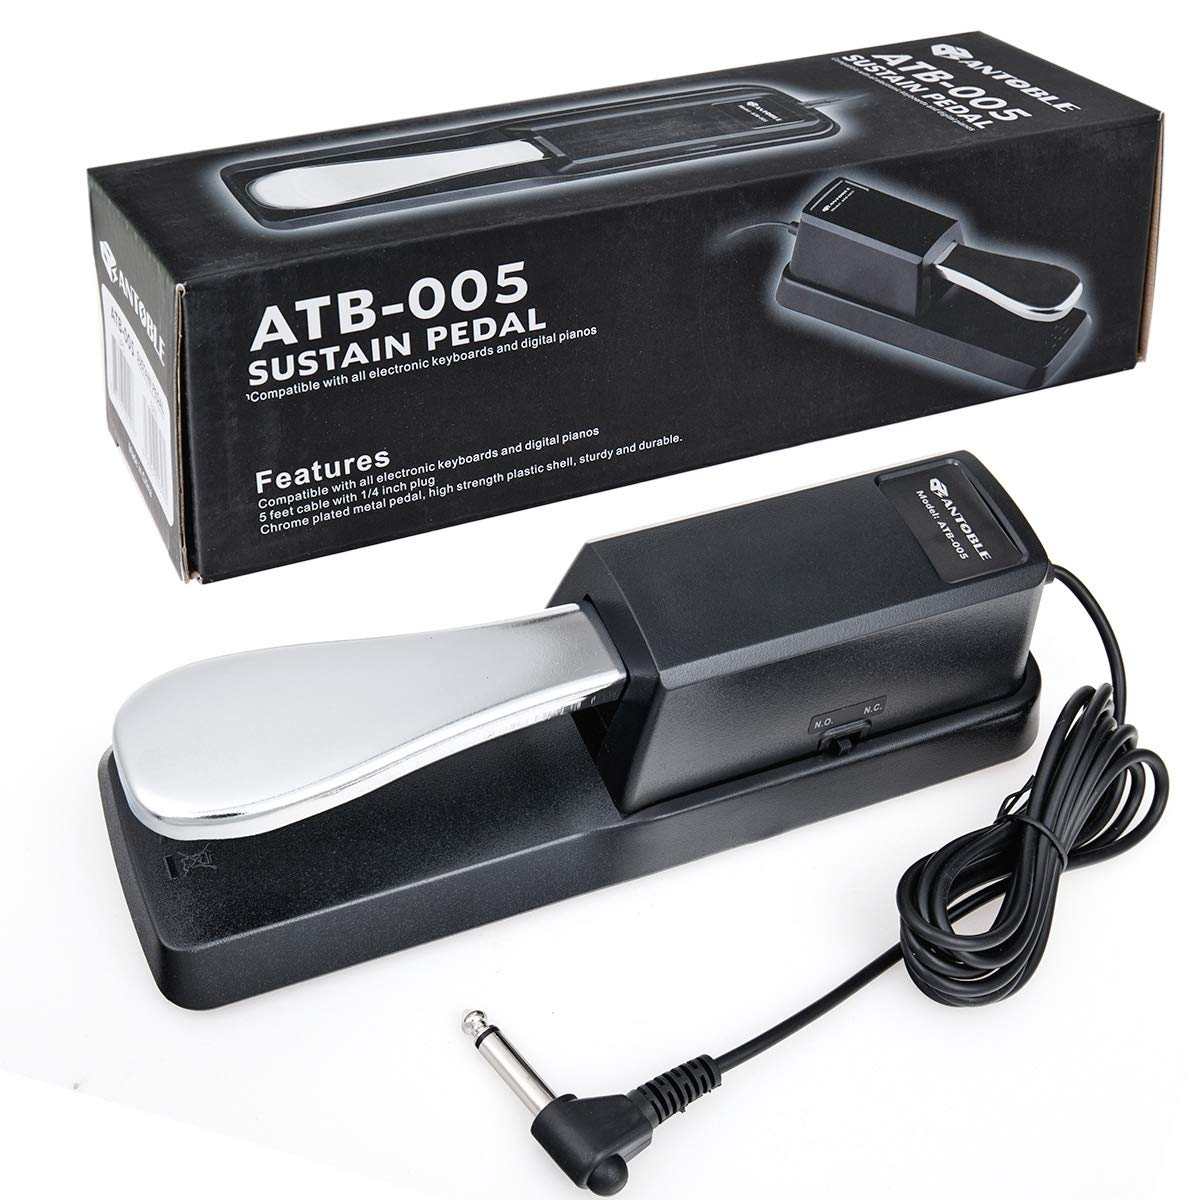 CTK-574 CTK-591 CTK-593 CTK-601 Power Supply//AC Adapter for Casio Keyboards